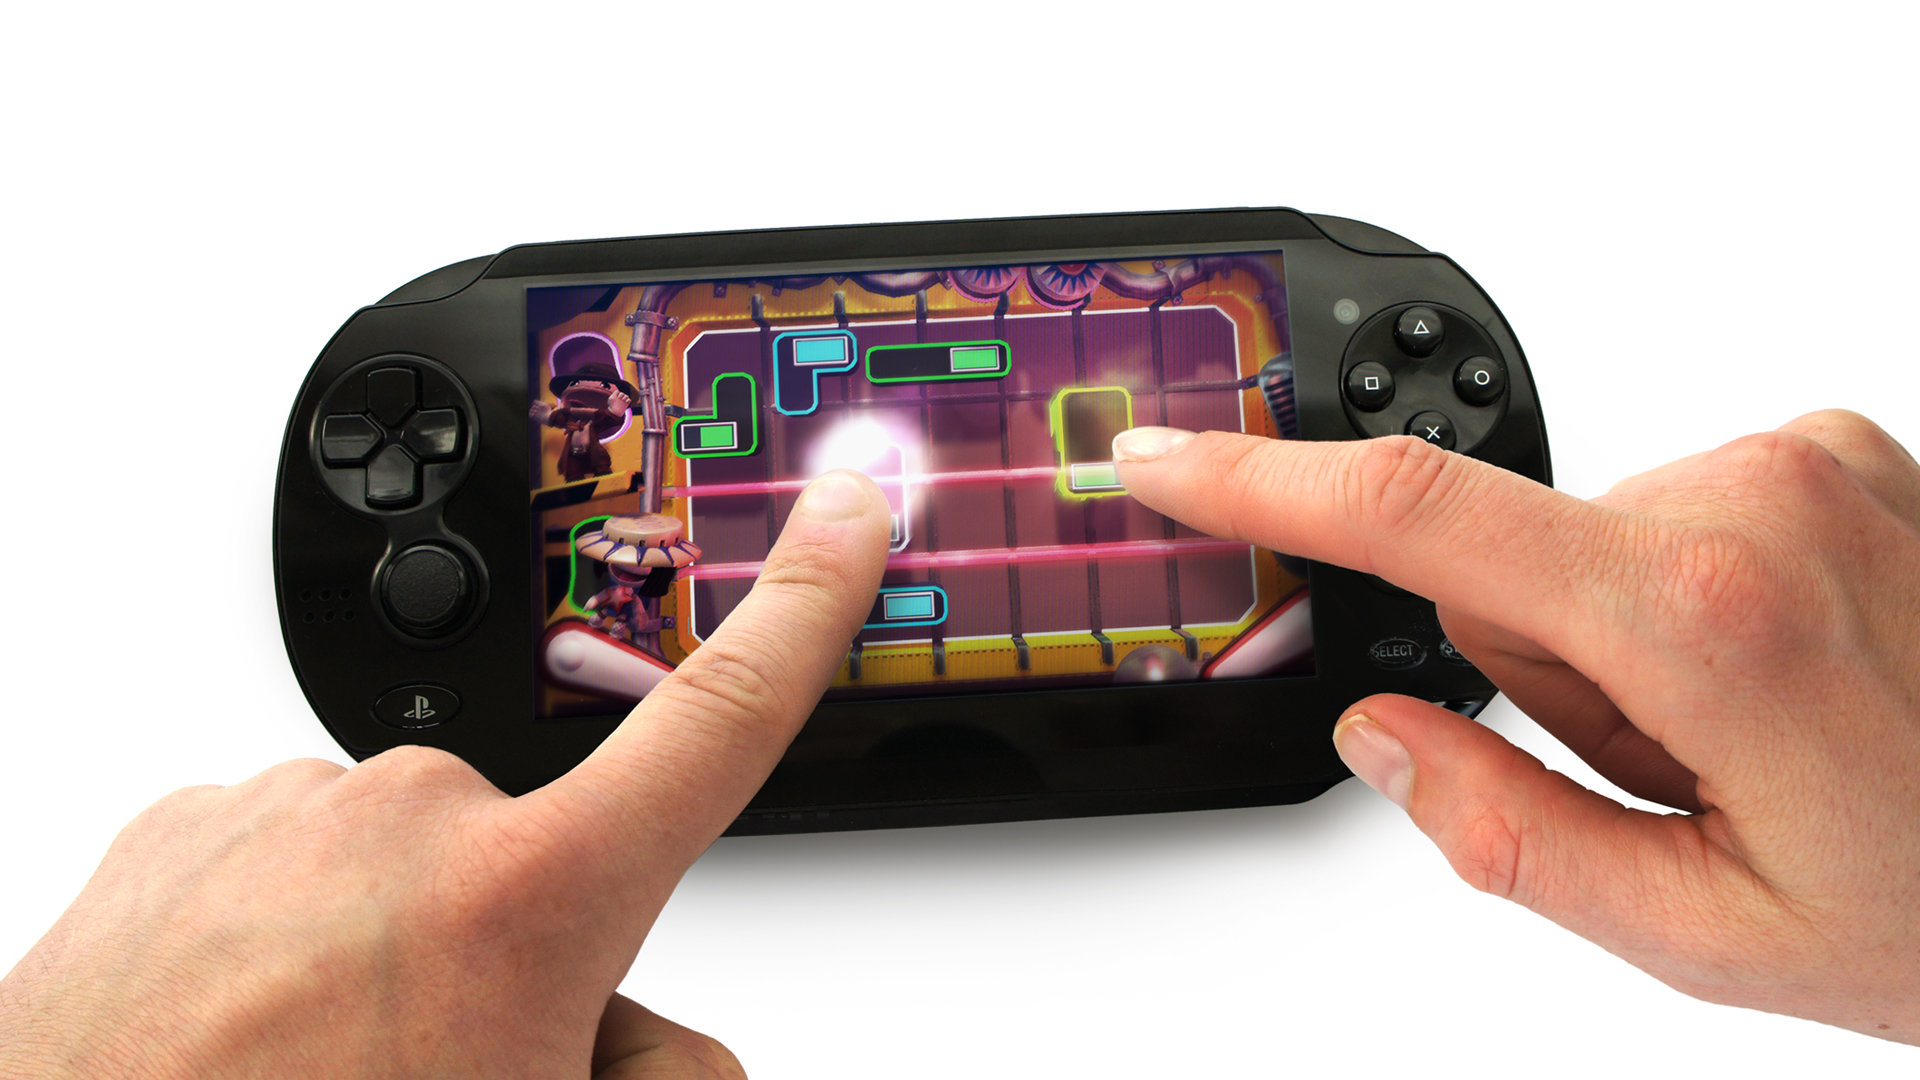 LittleBigPlanet™ PlayStation® Vita Game | PSVITA - PlayStation